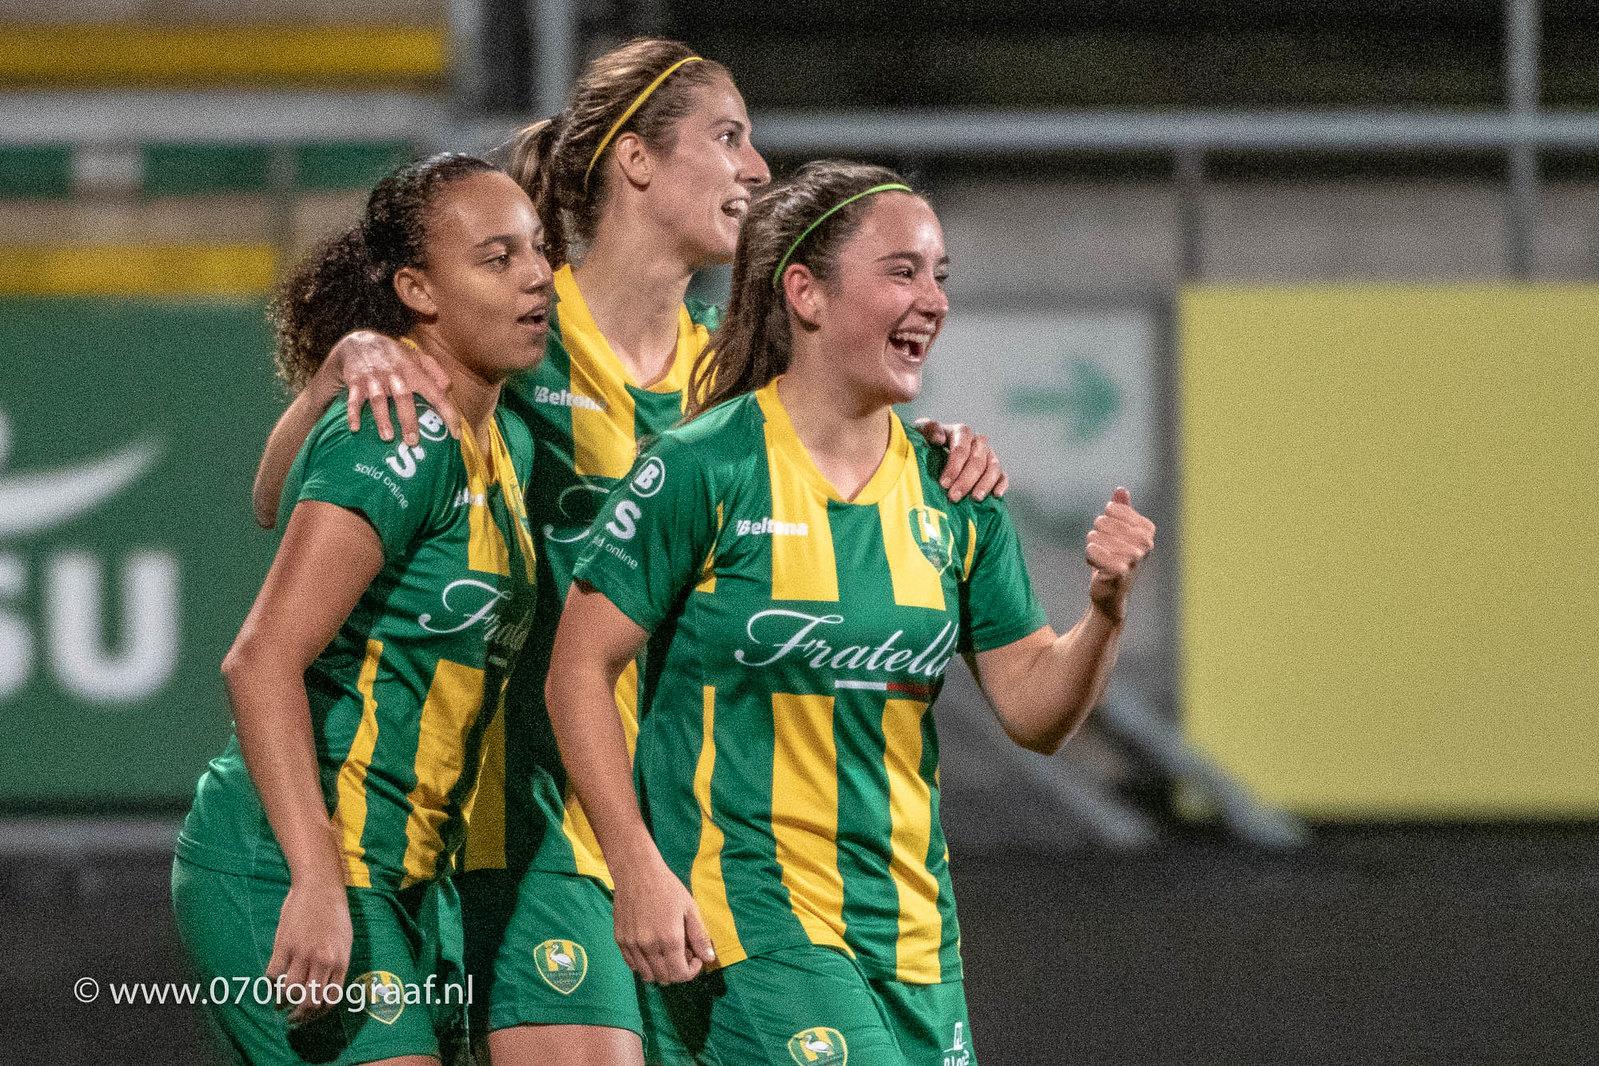 Voetbal: 2018-09-28 vrouwen ADO – FC Twente [3-1]